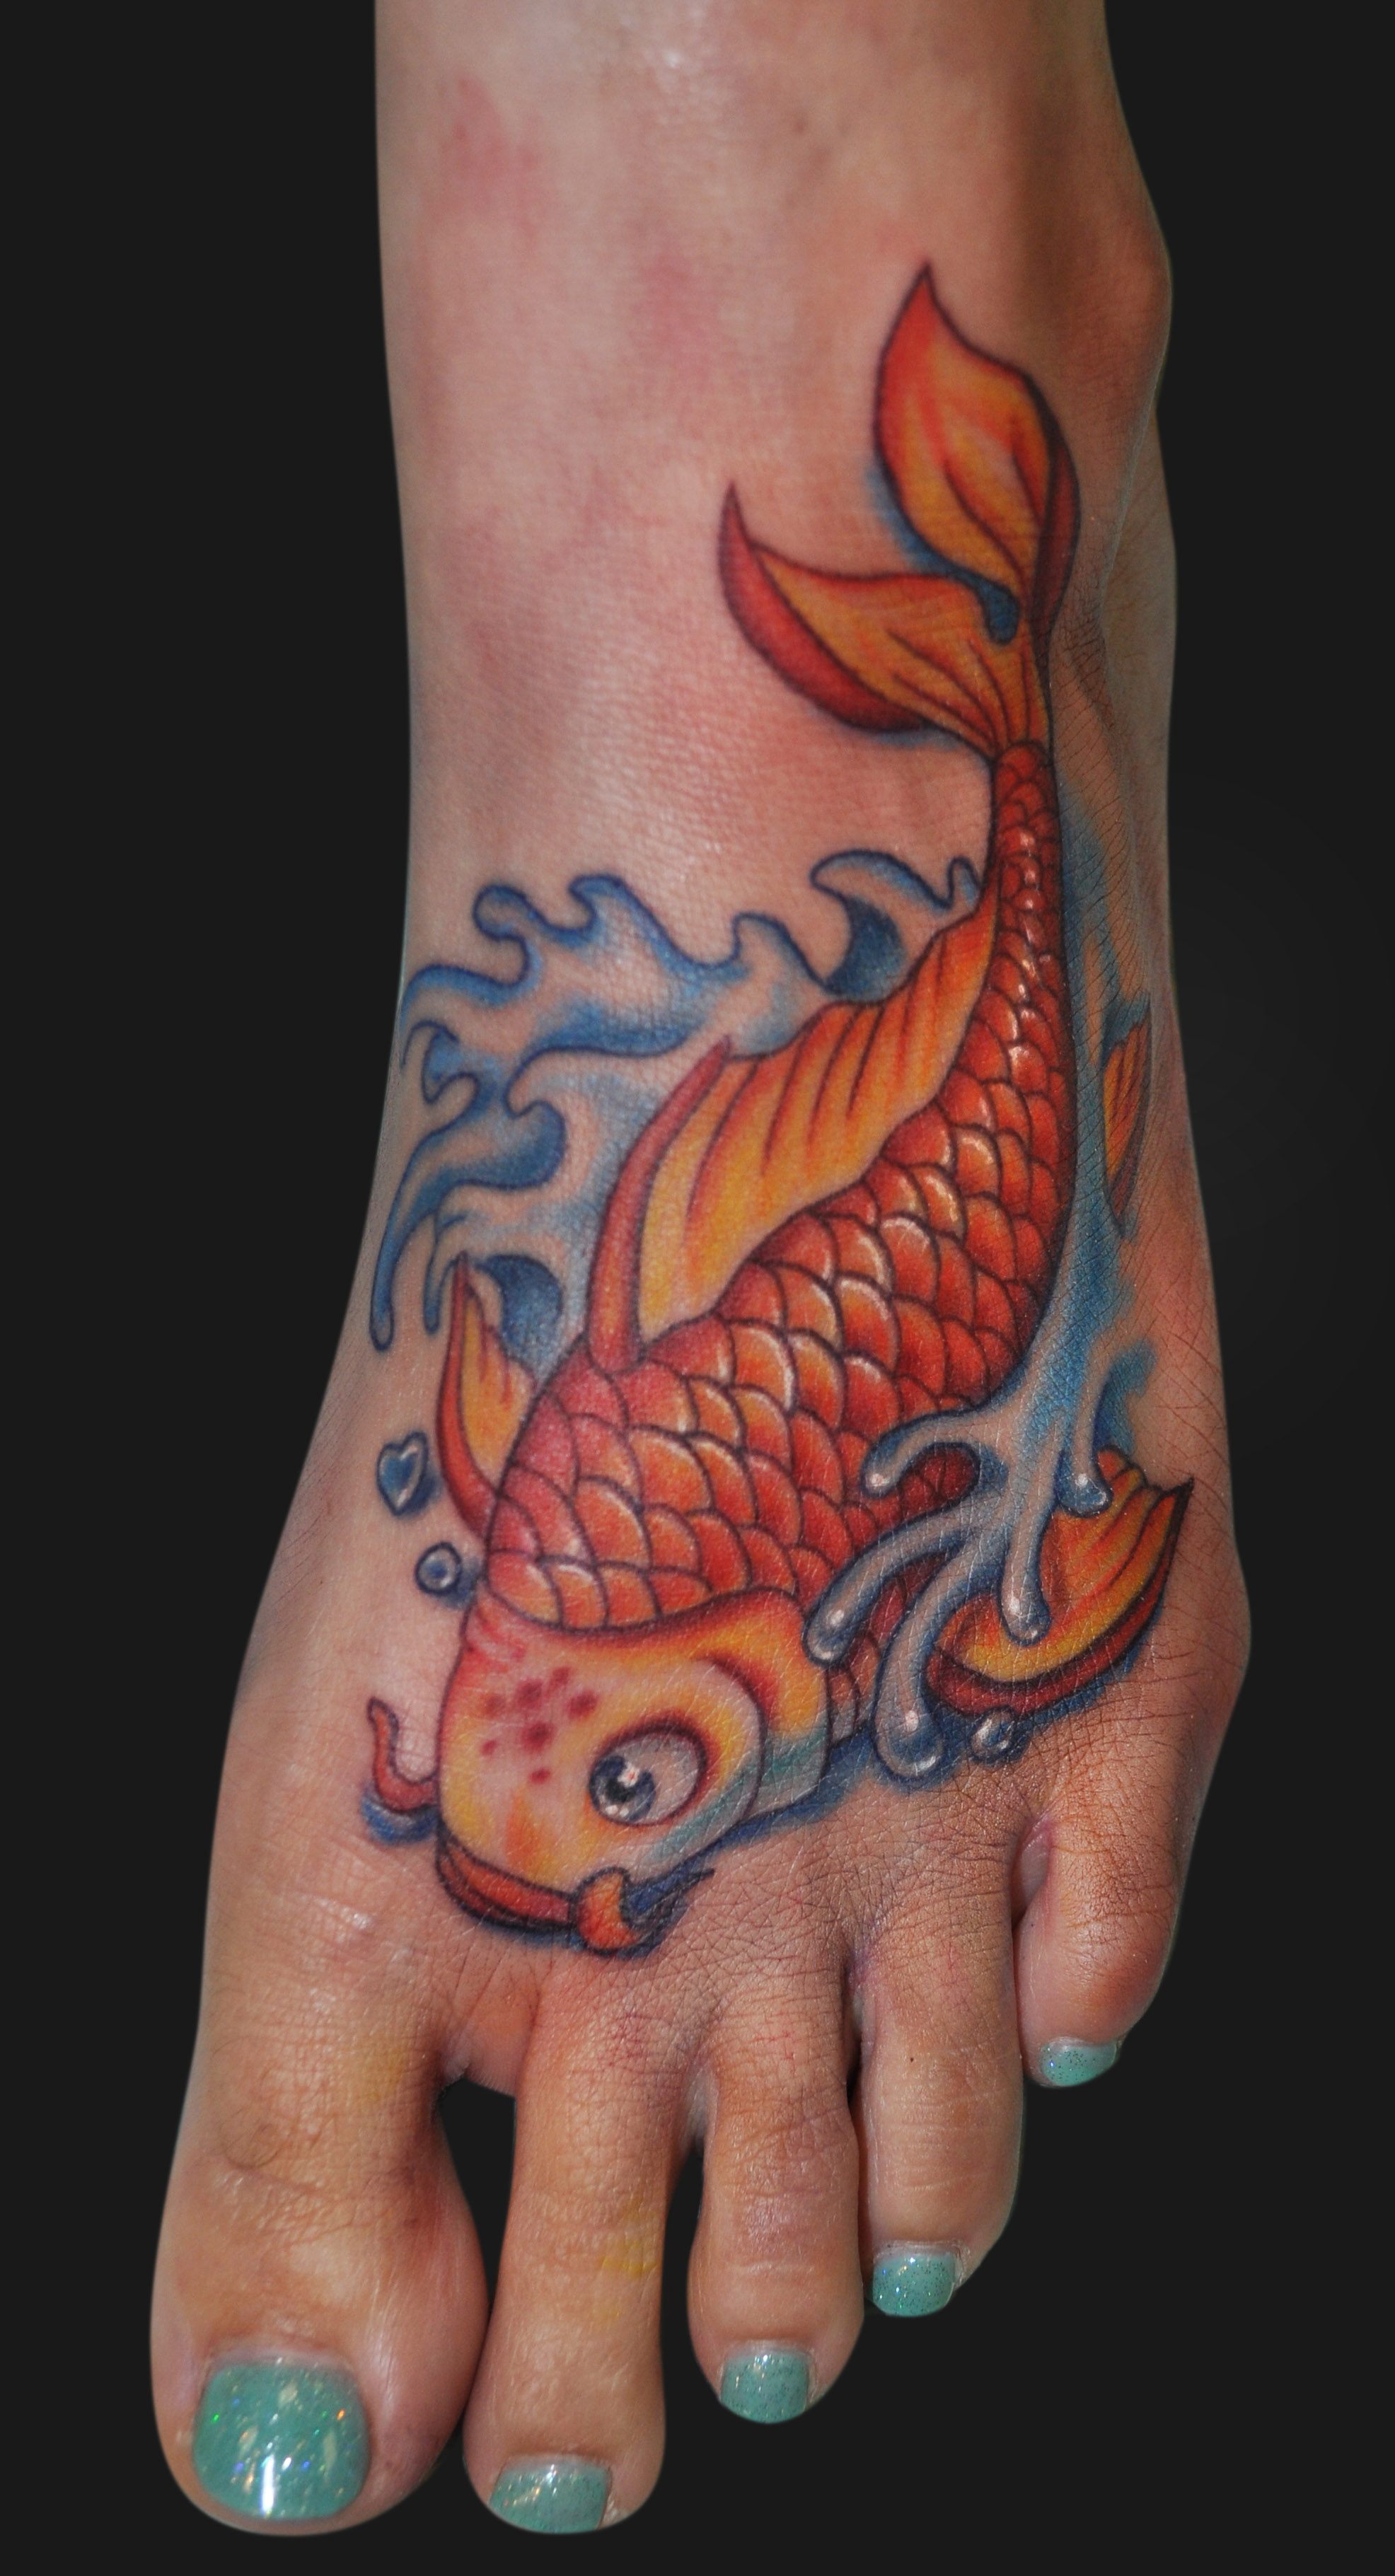 Fish Tattoo Images & Designs